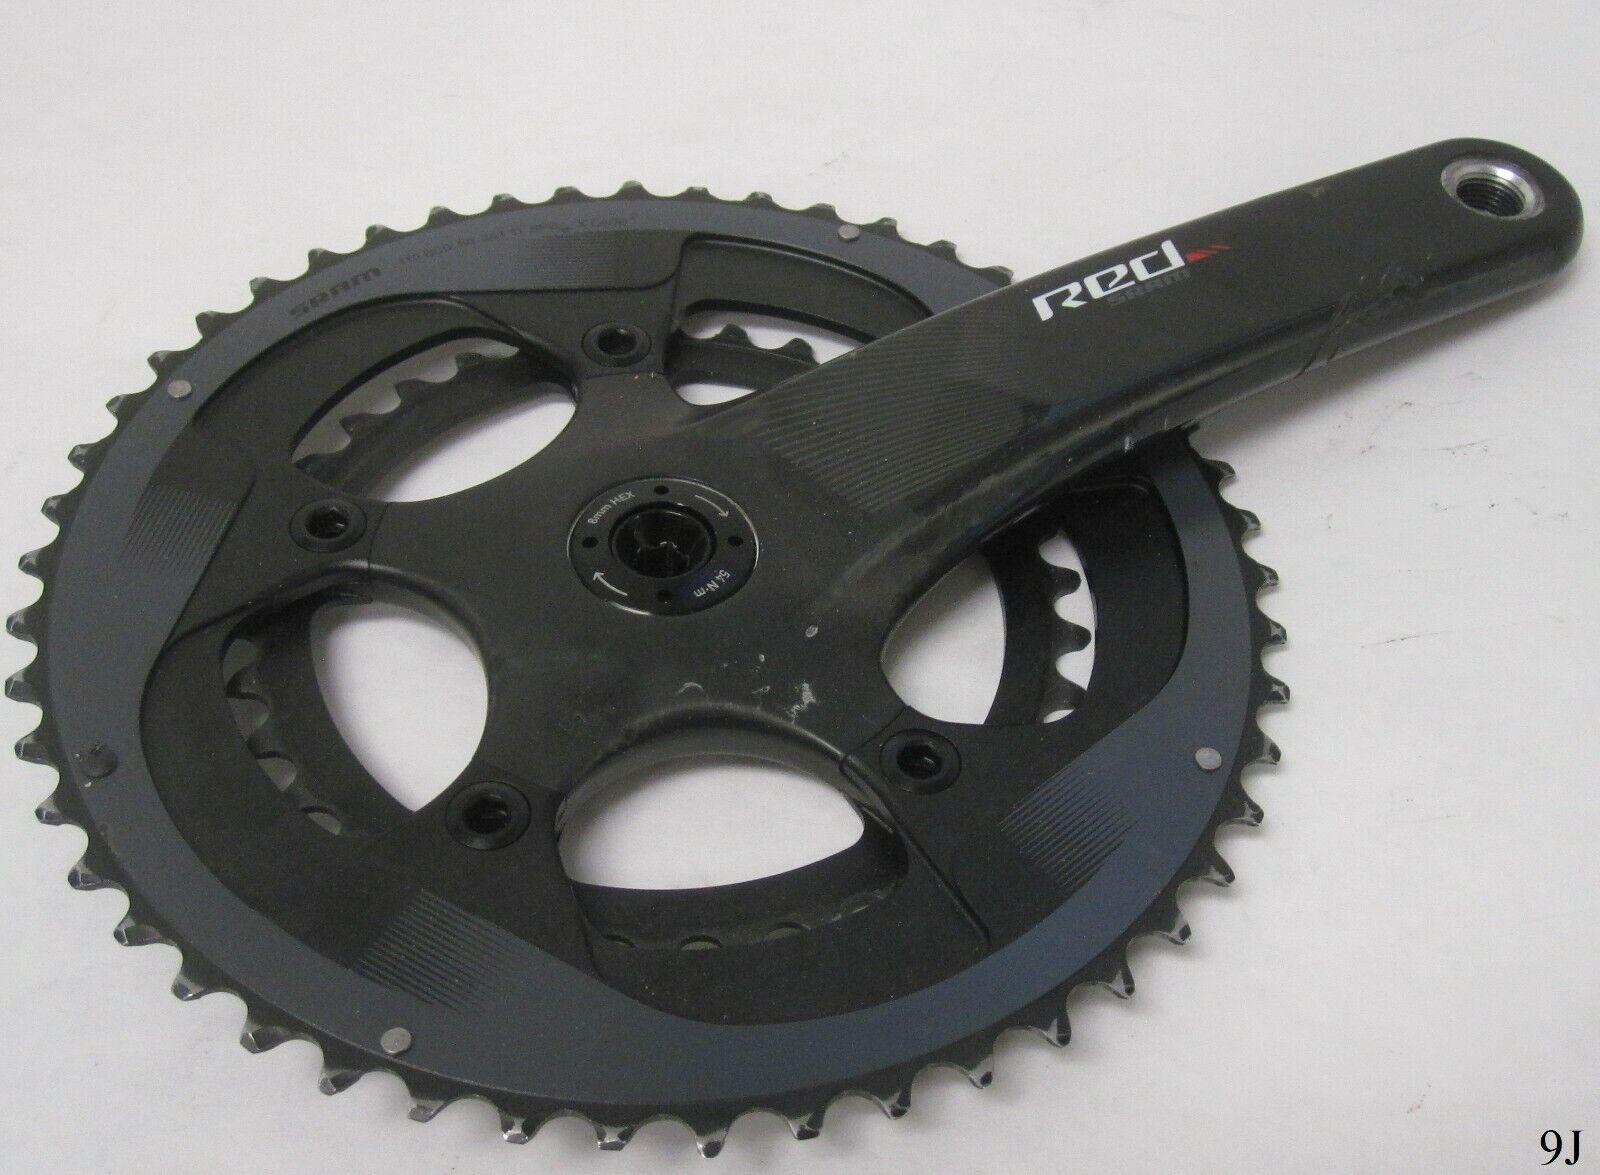 Sram rot X Glide Crank Arm und Chainrings 50 34T11 Spd110 BCD